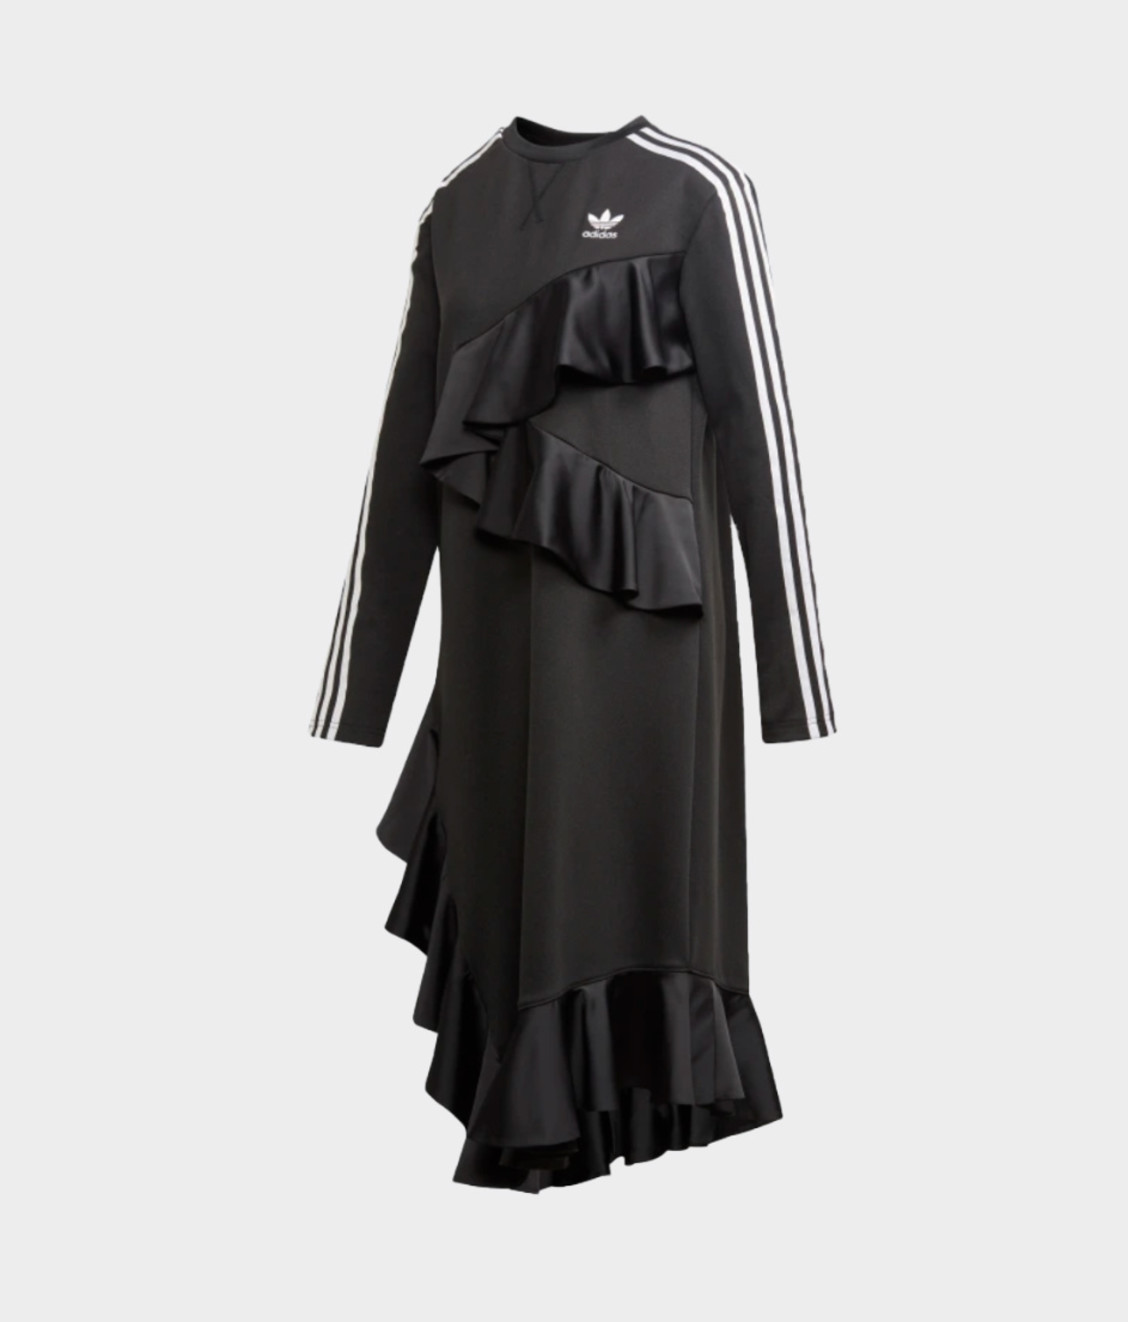 Adidas Adidas x J KOO Dress Black